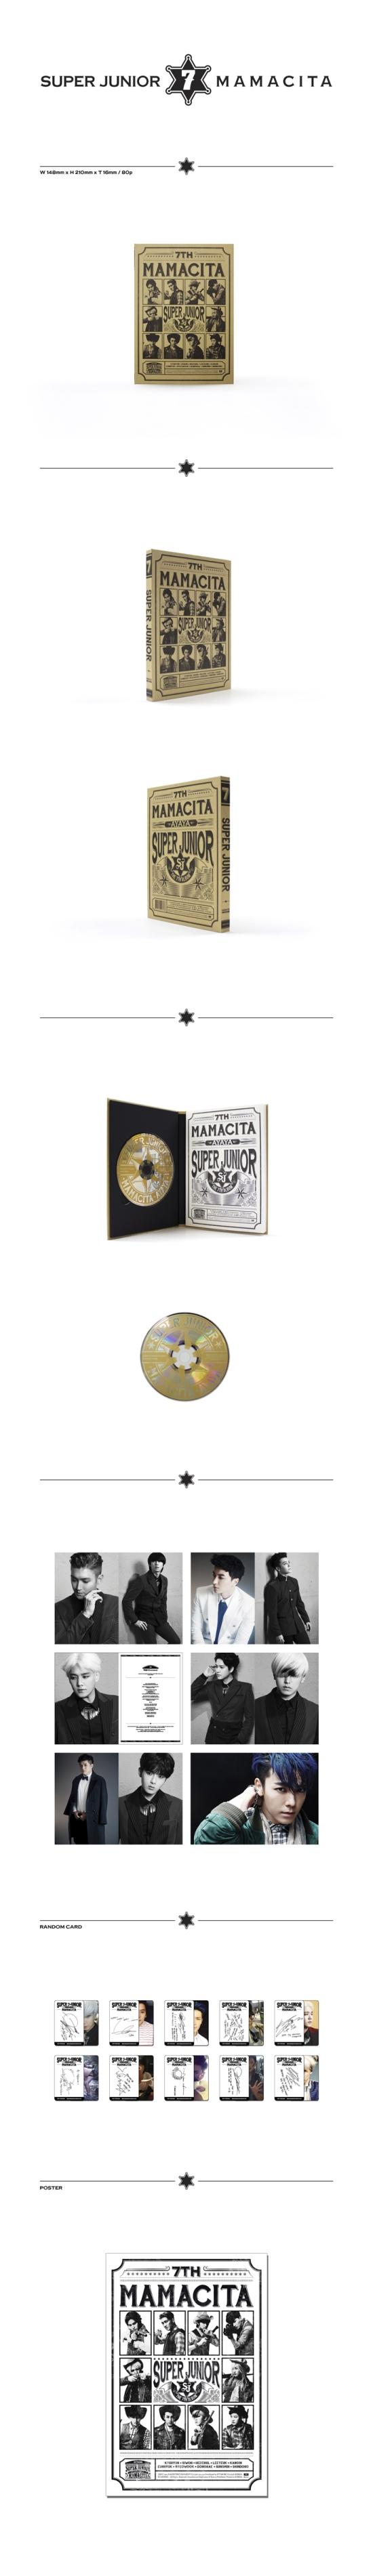 140903 mamacita b version